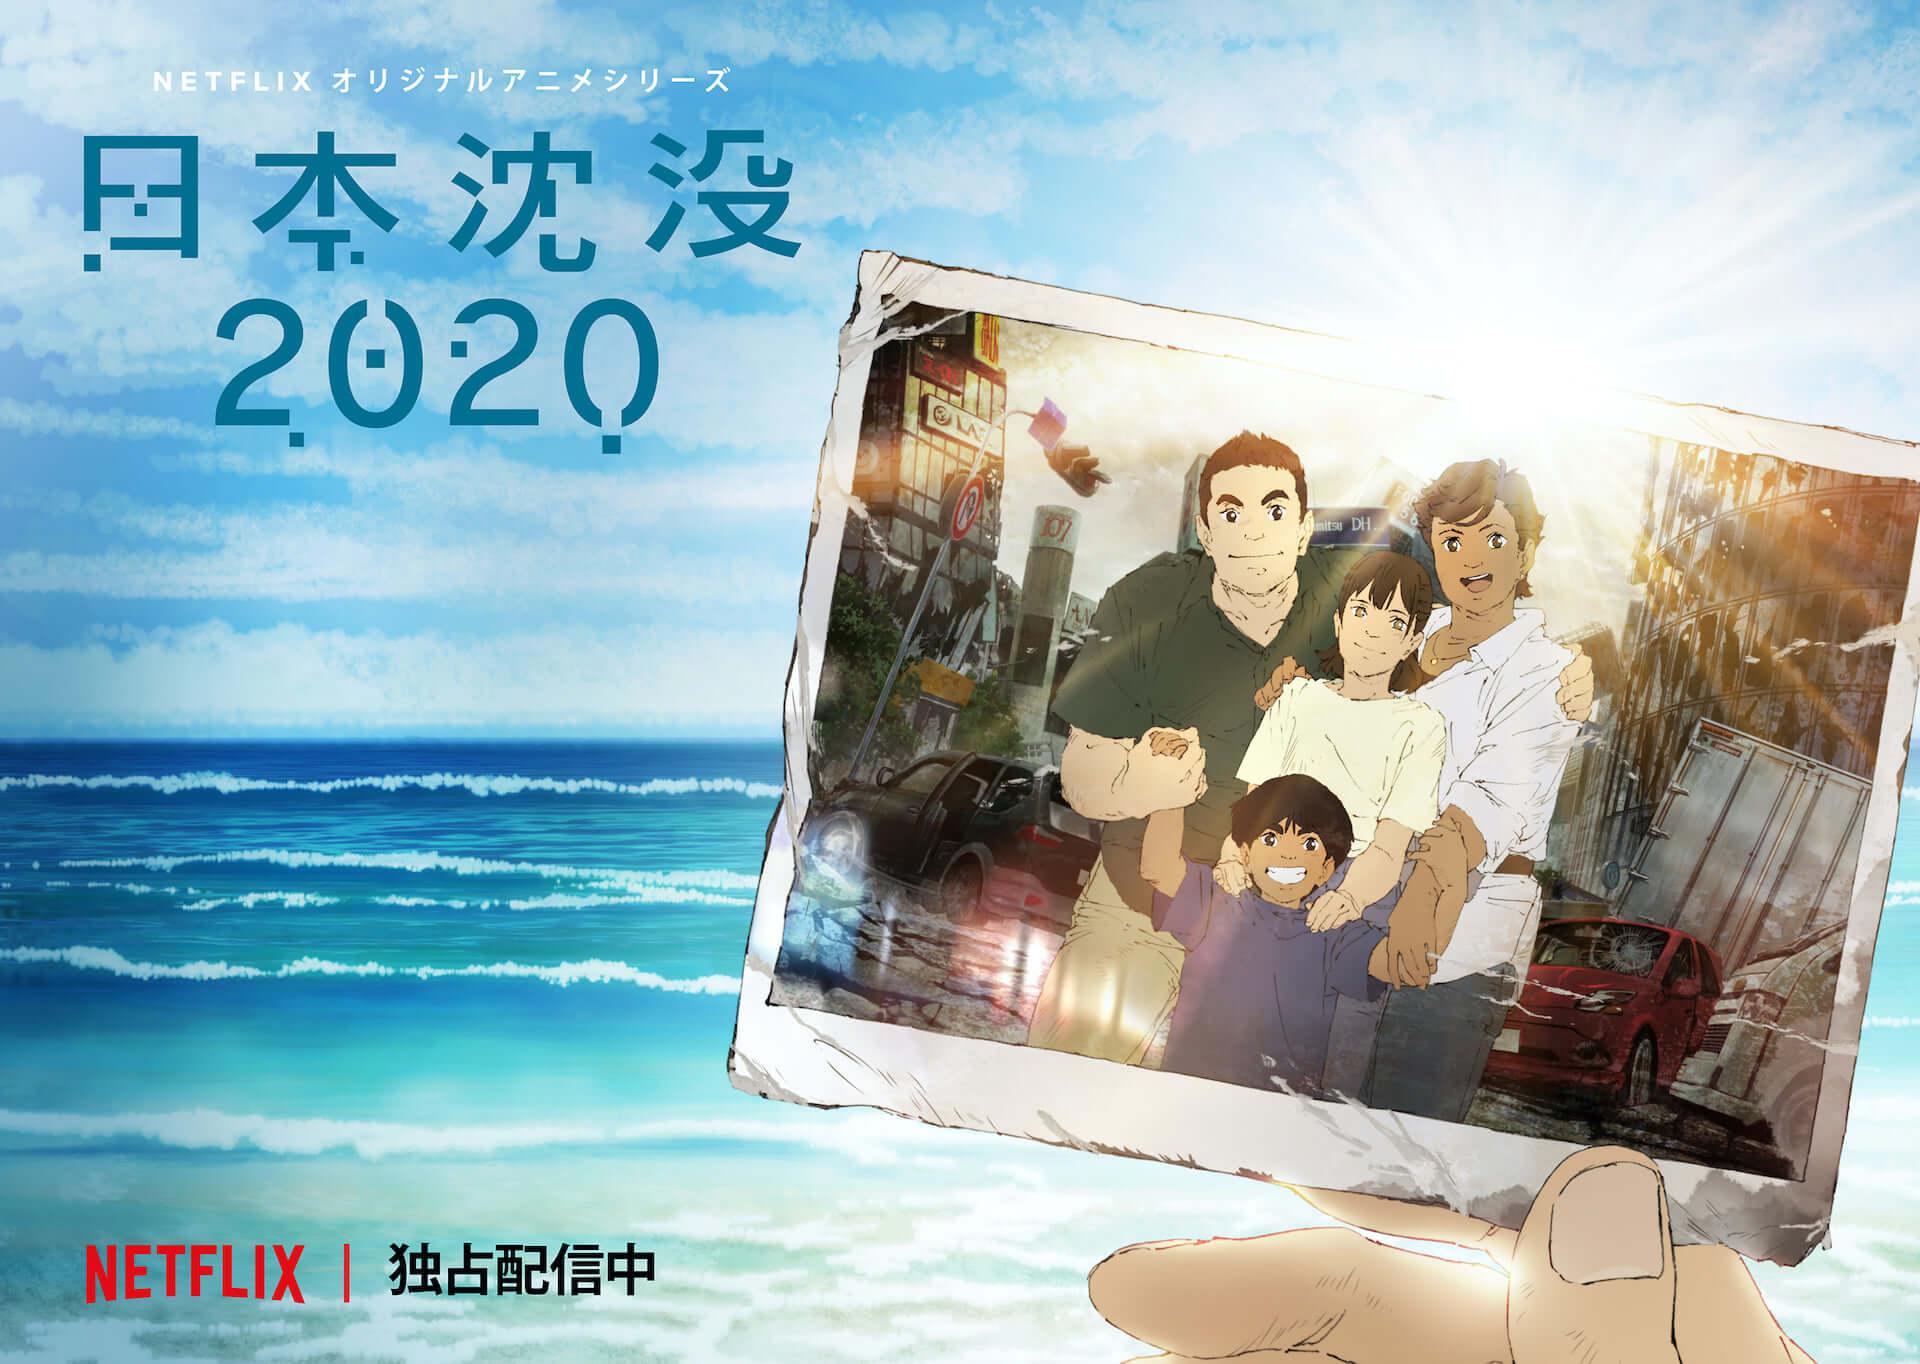 "Netflix『日本沈没2020』主題歌に起用された大貫妙子&坂本龍一""a life""の2010年のライブ映像が公開! music200720_alife-japansinks_2-1920x1364"